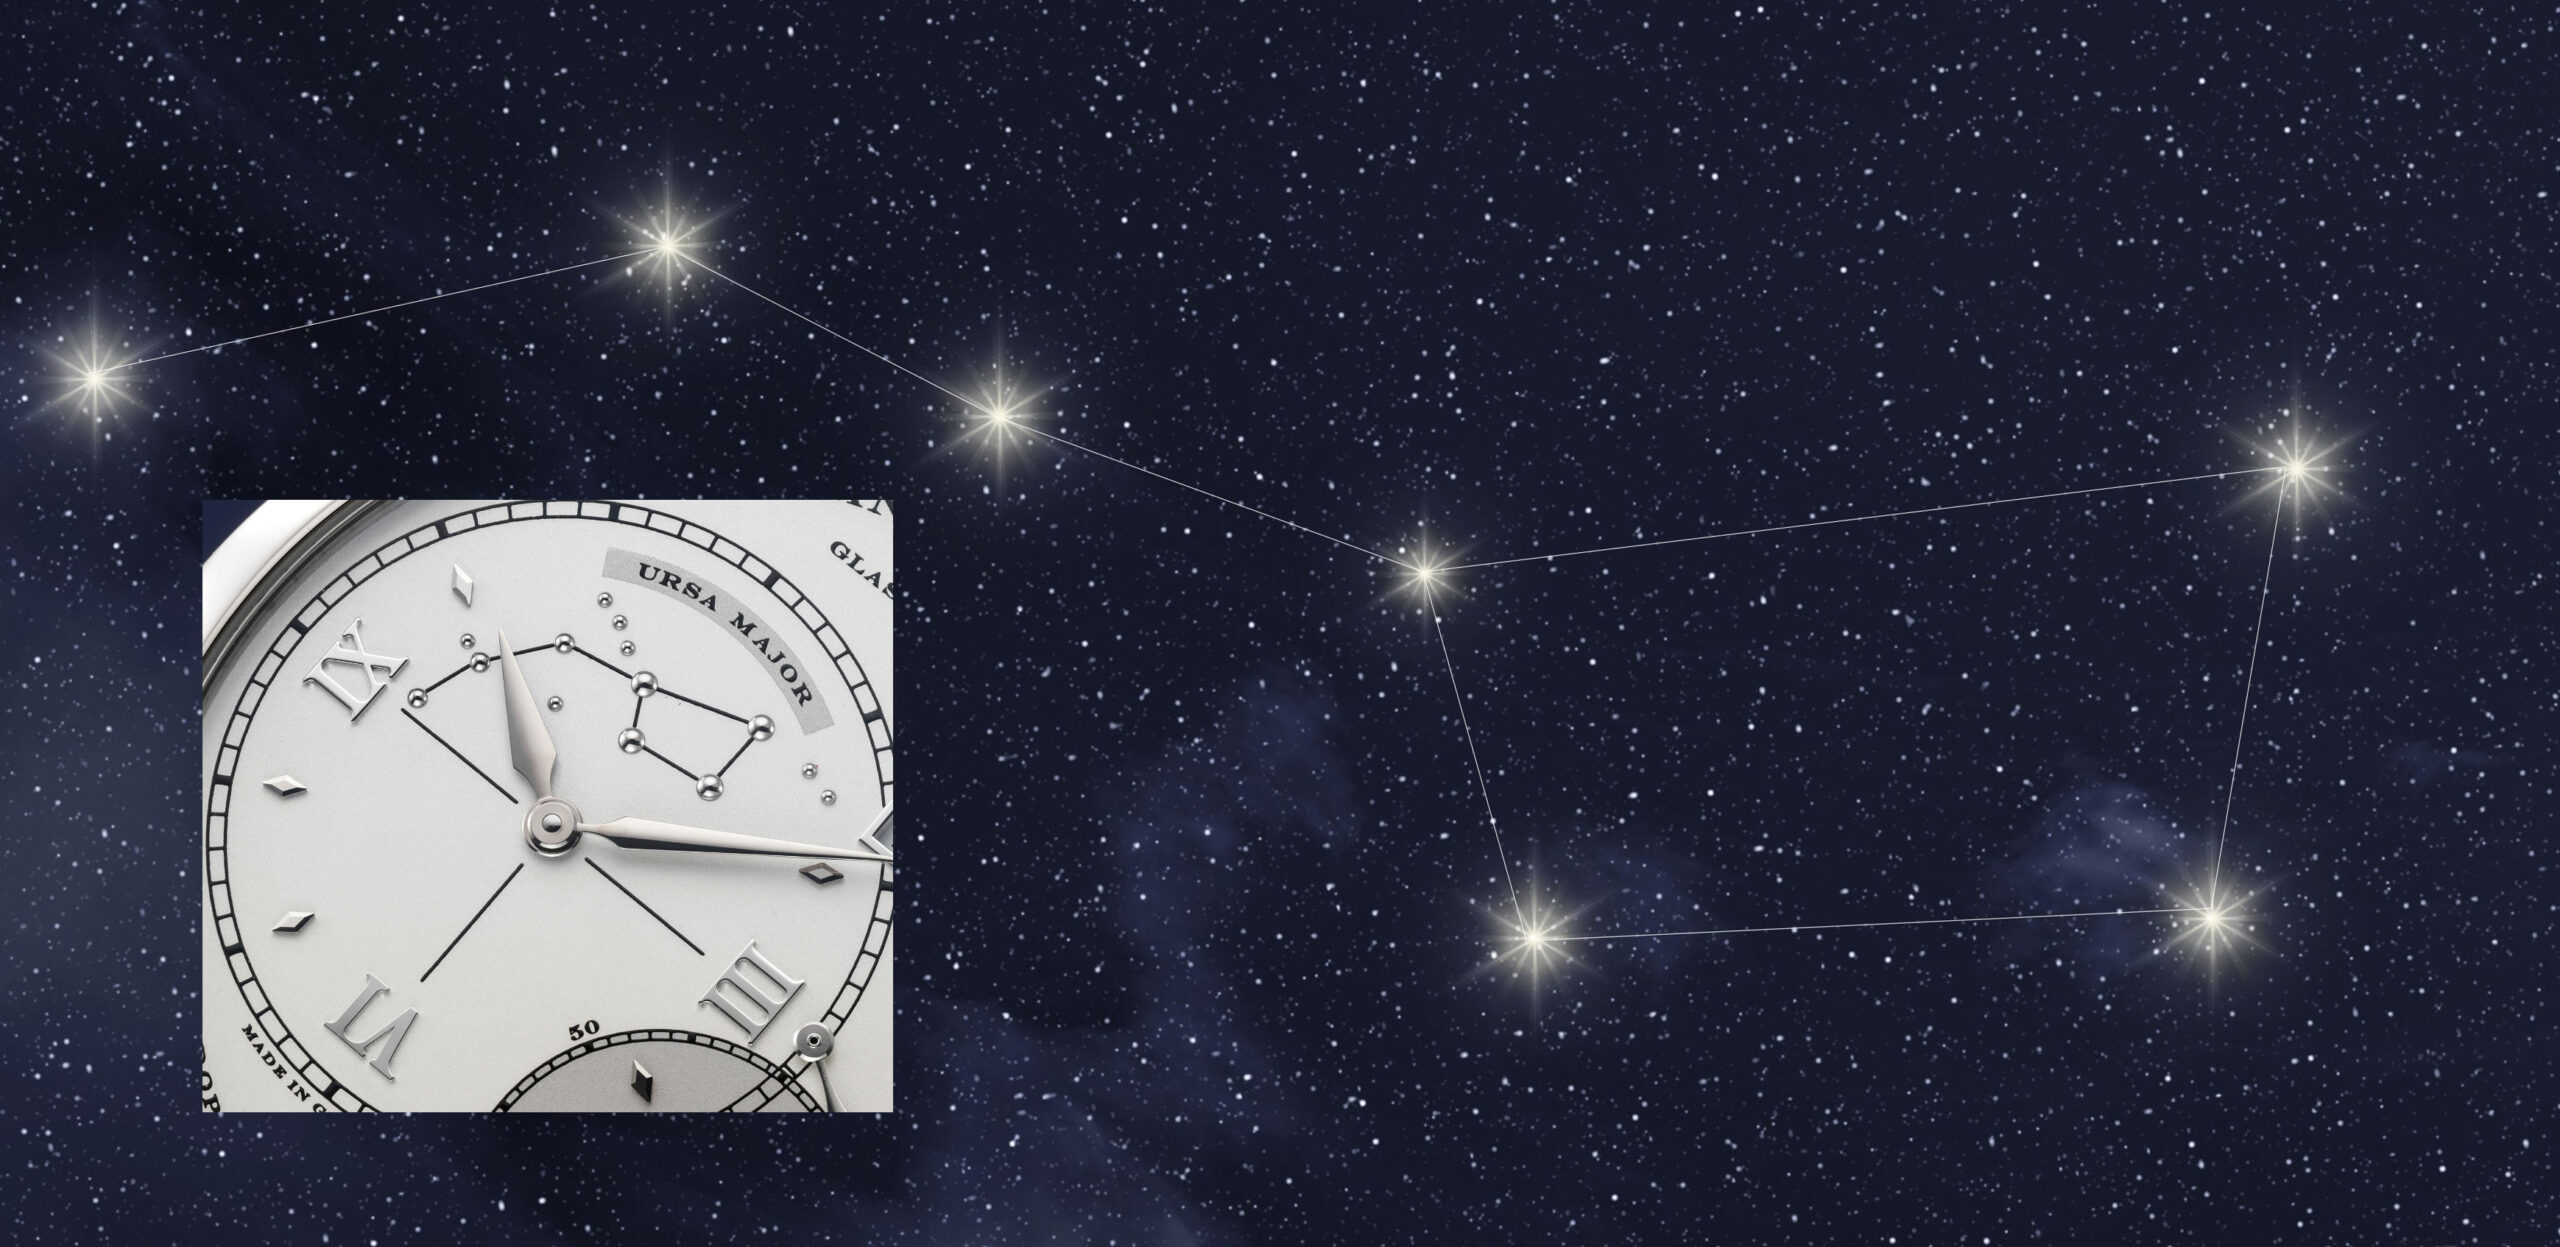 Grand Lange 1 Luna Mundi 119.026 Big Dipper Constellation